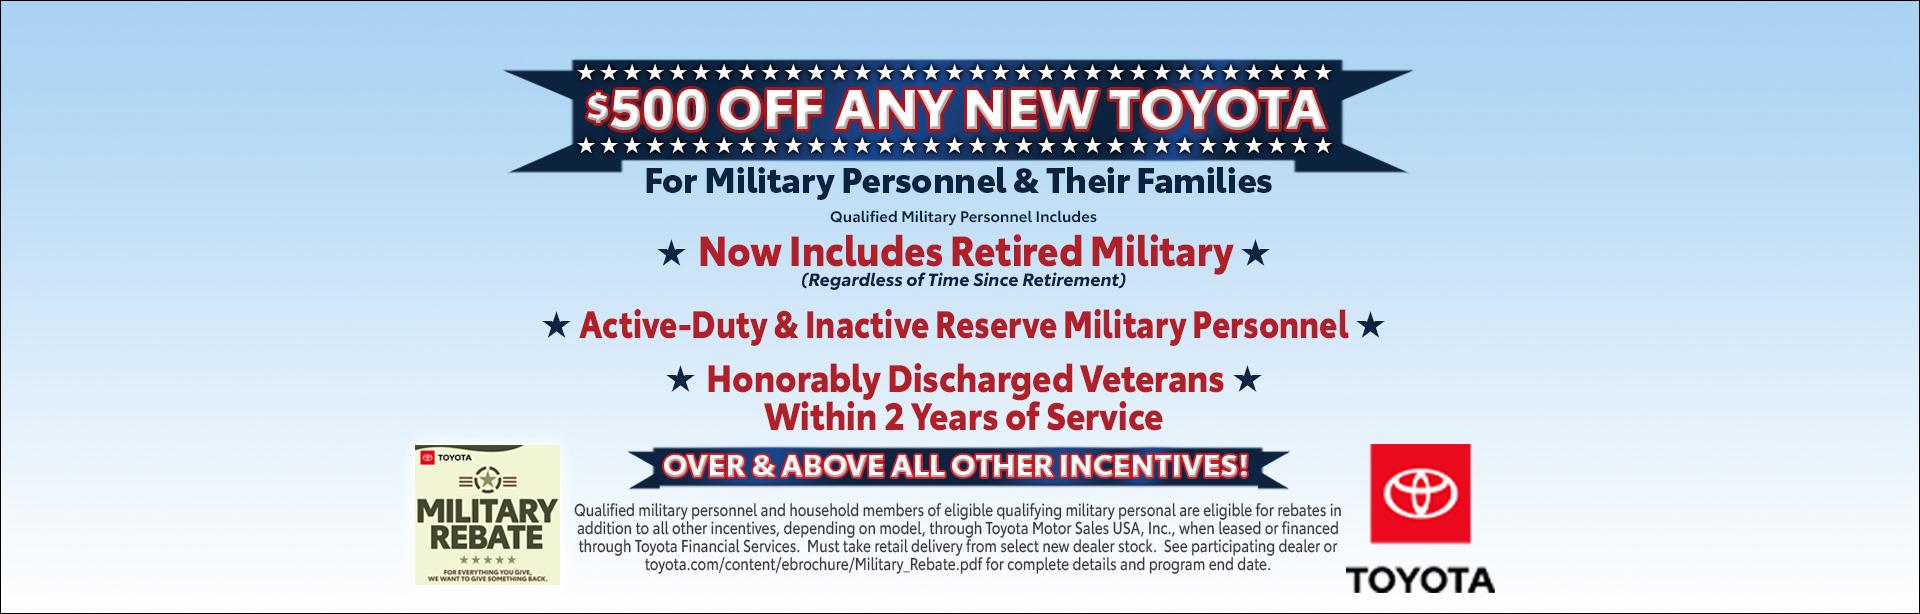 04-21_01_Cincinnati-April-2021-CIN-Military-Rebate_1920x614_6111_All-Models_O_xta.jpeg